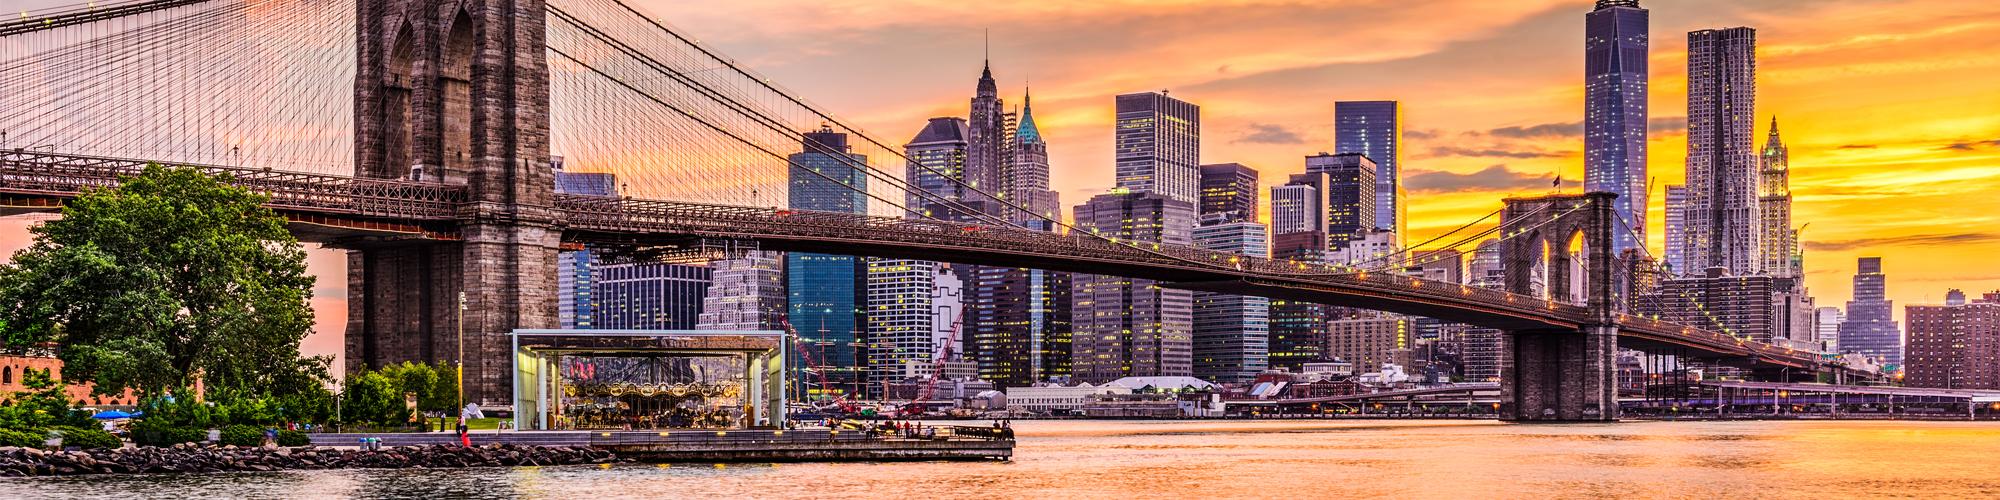 Viajes Nueva York Easter Week - El País Viajes